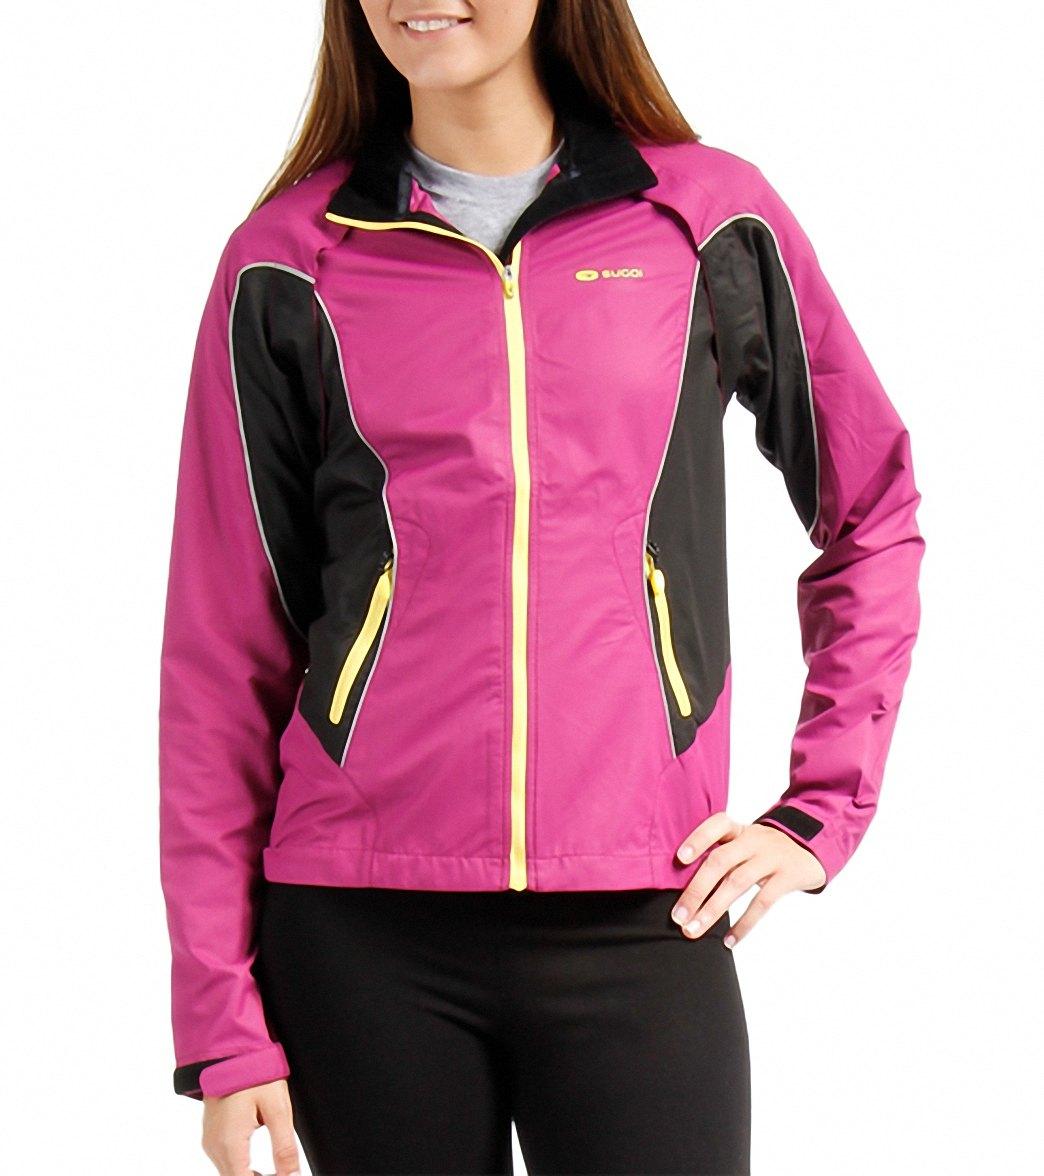 Sugoi Women S Versa Running Jacket At Swimoutlet Com